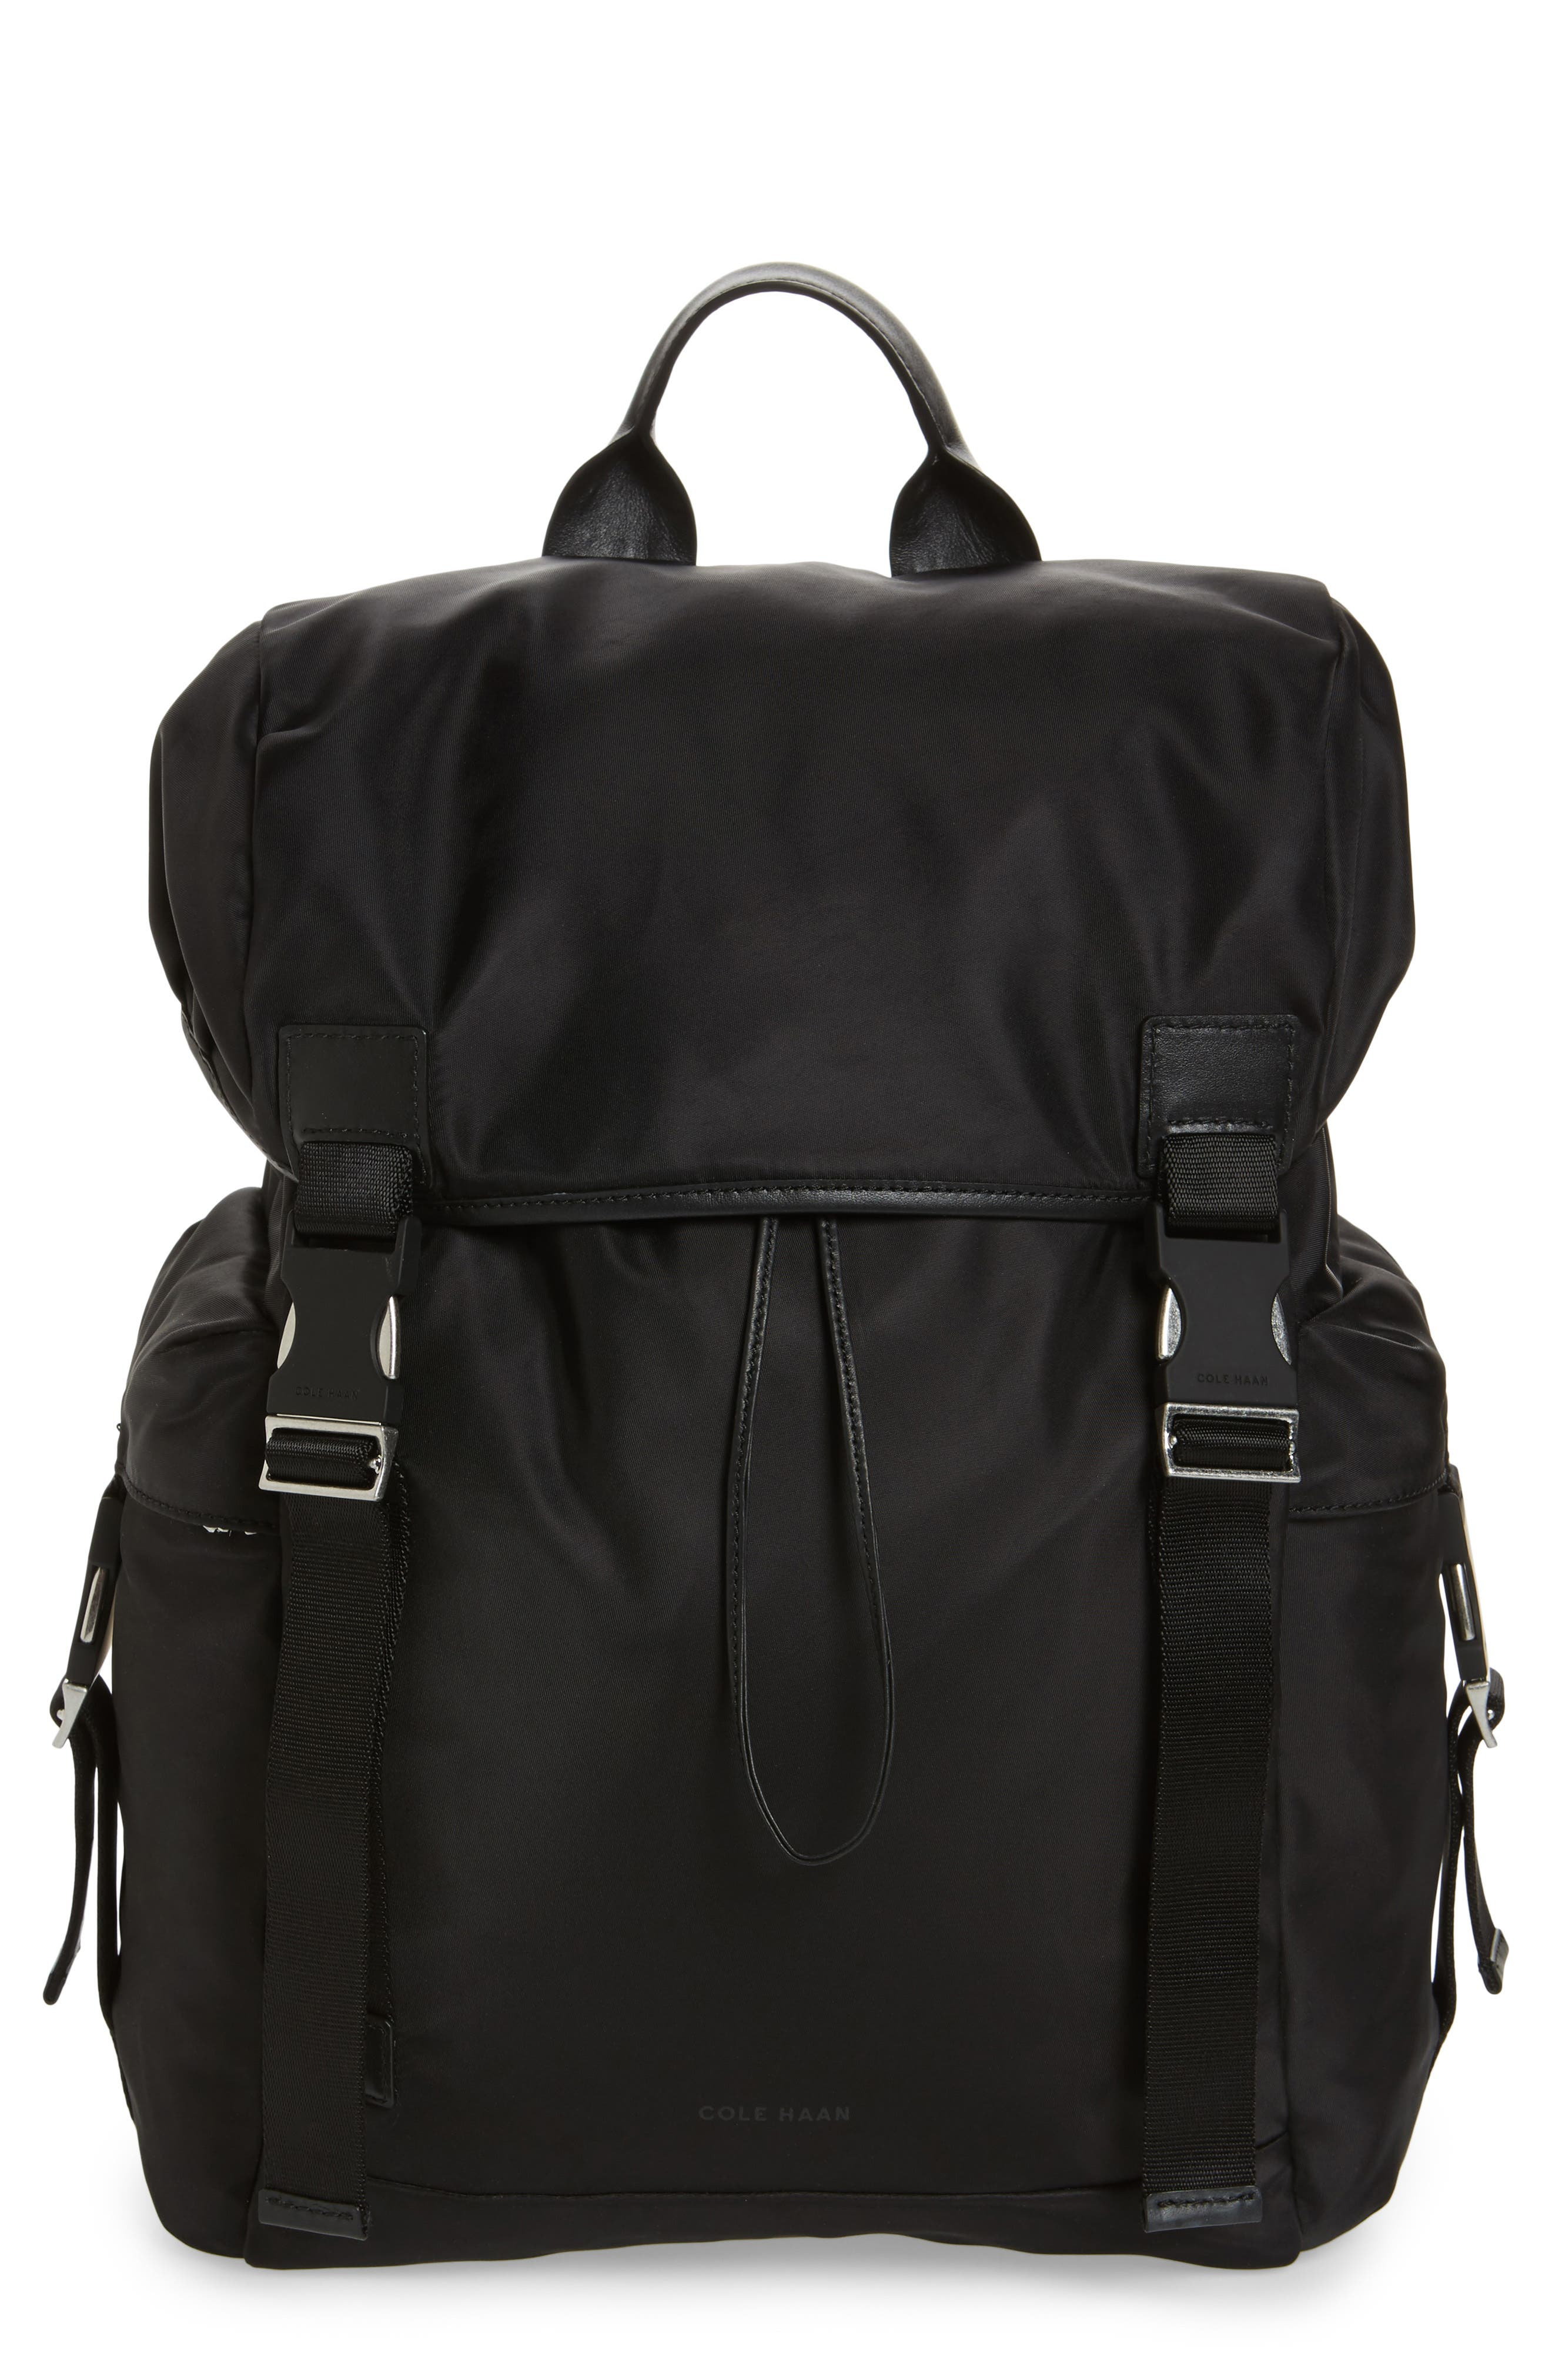 City Backpack,                             Main thumbnail 1, color,                             Black